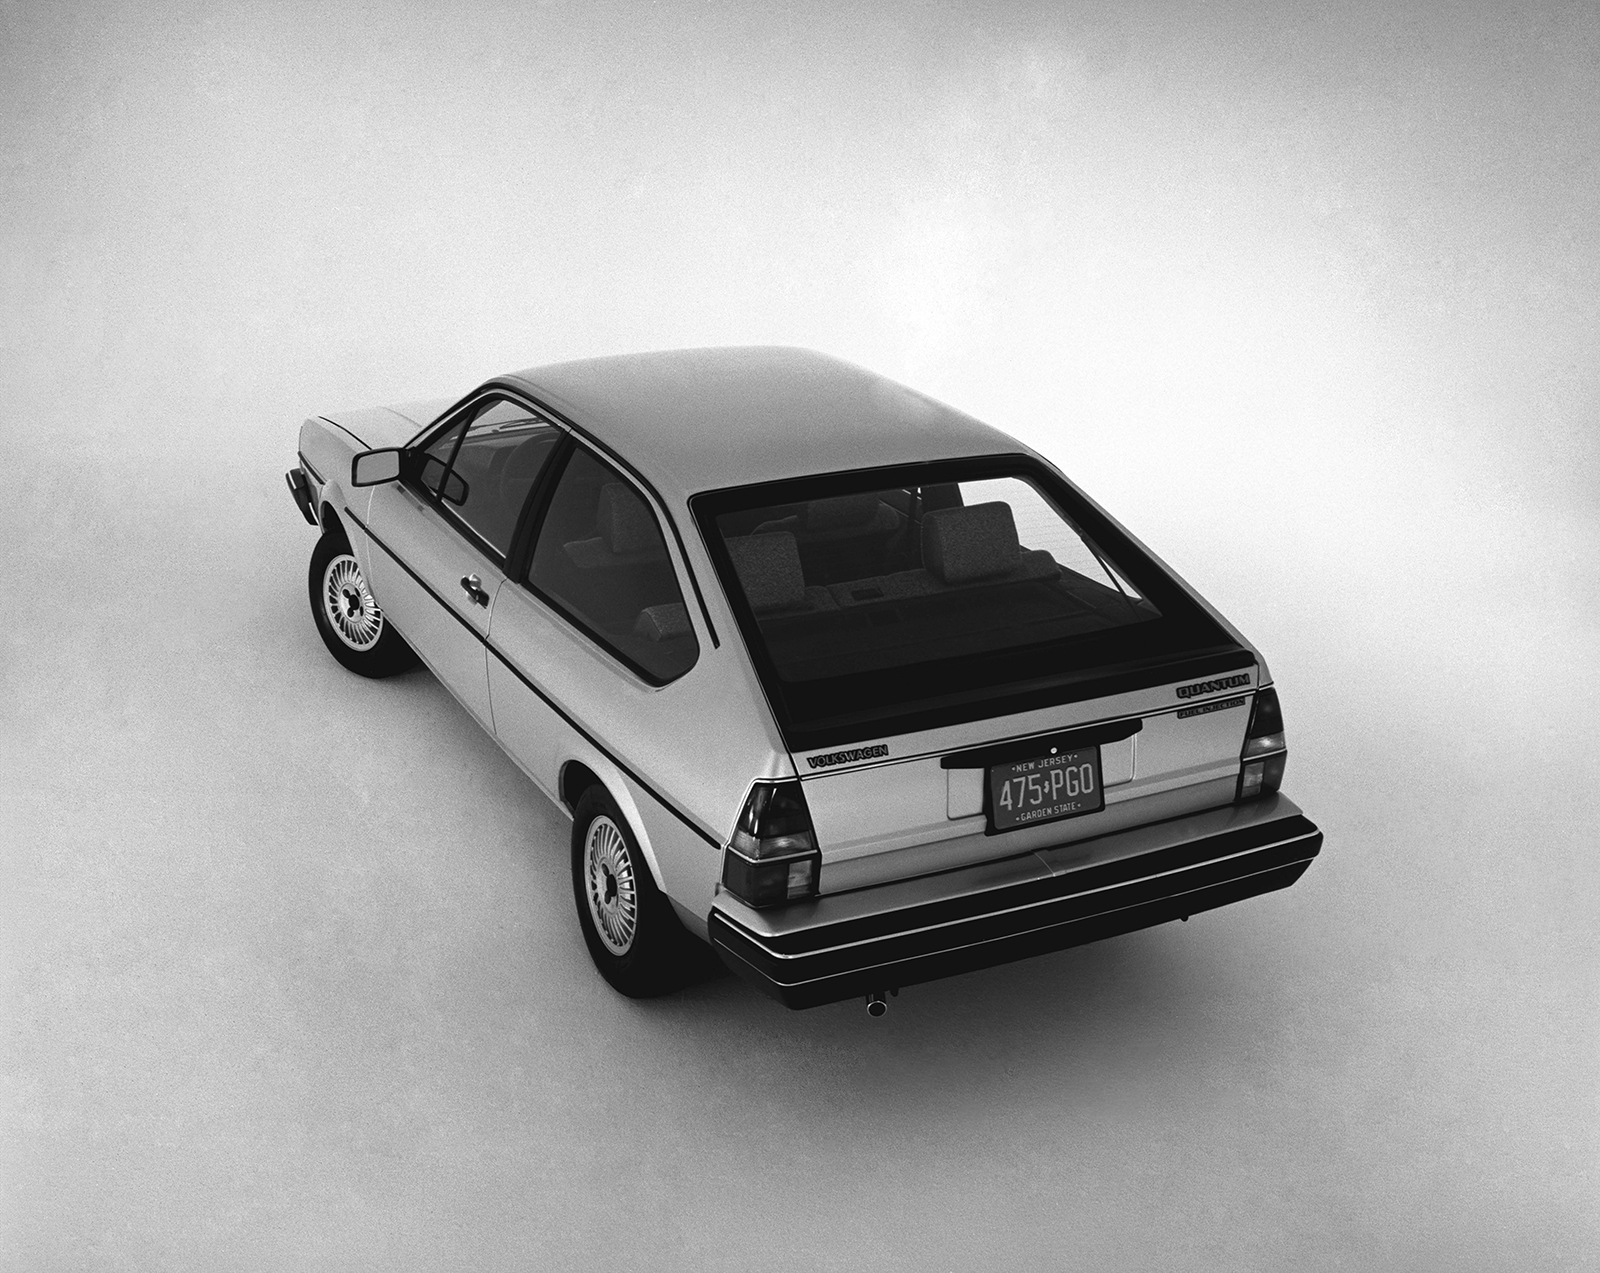 Volkswagen_Quantum_Passat_B2--11808